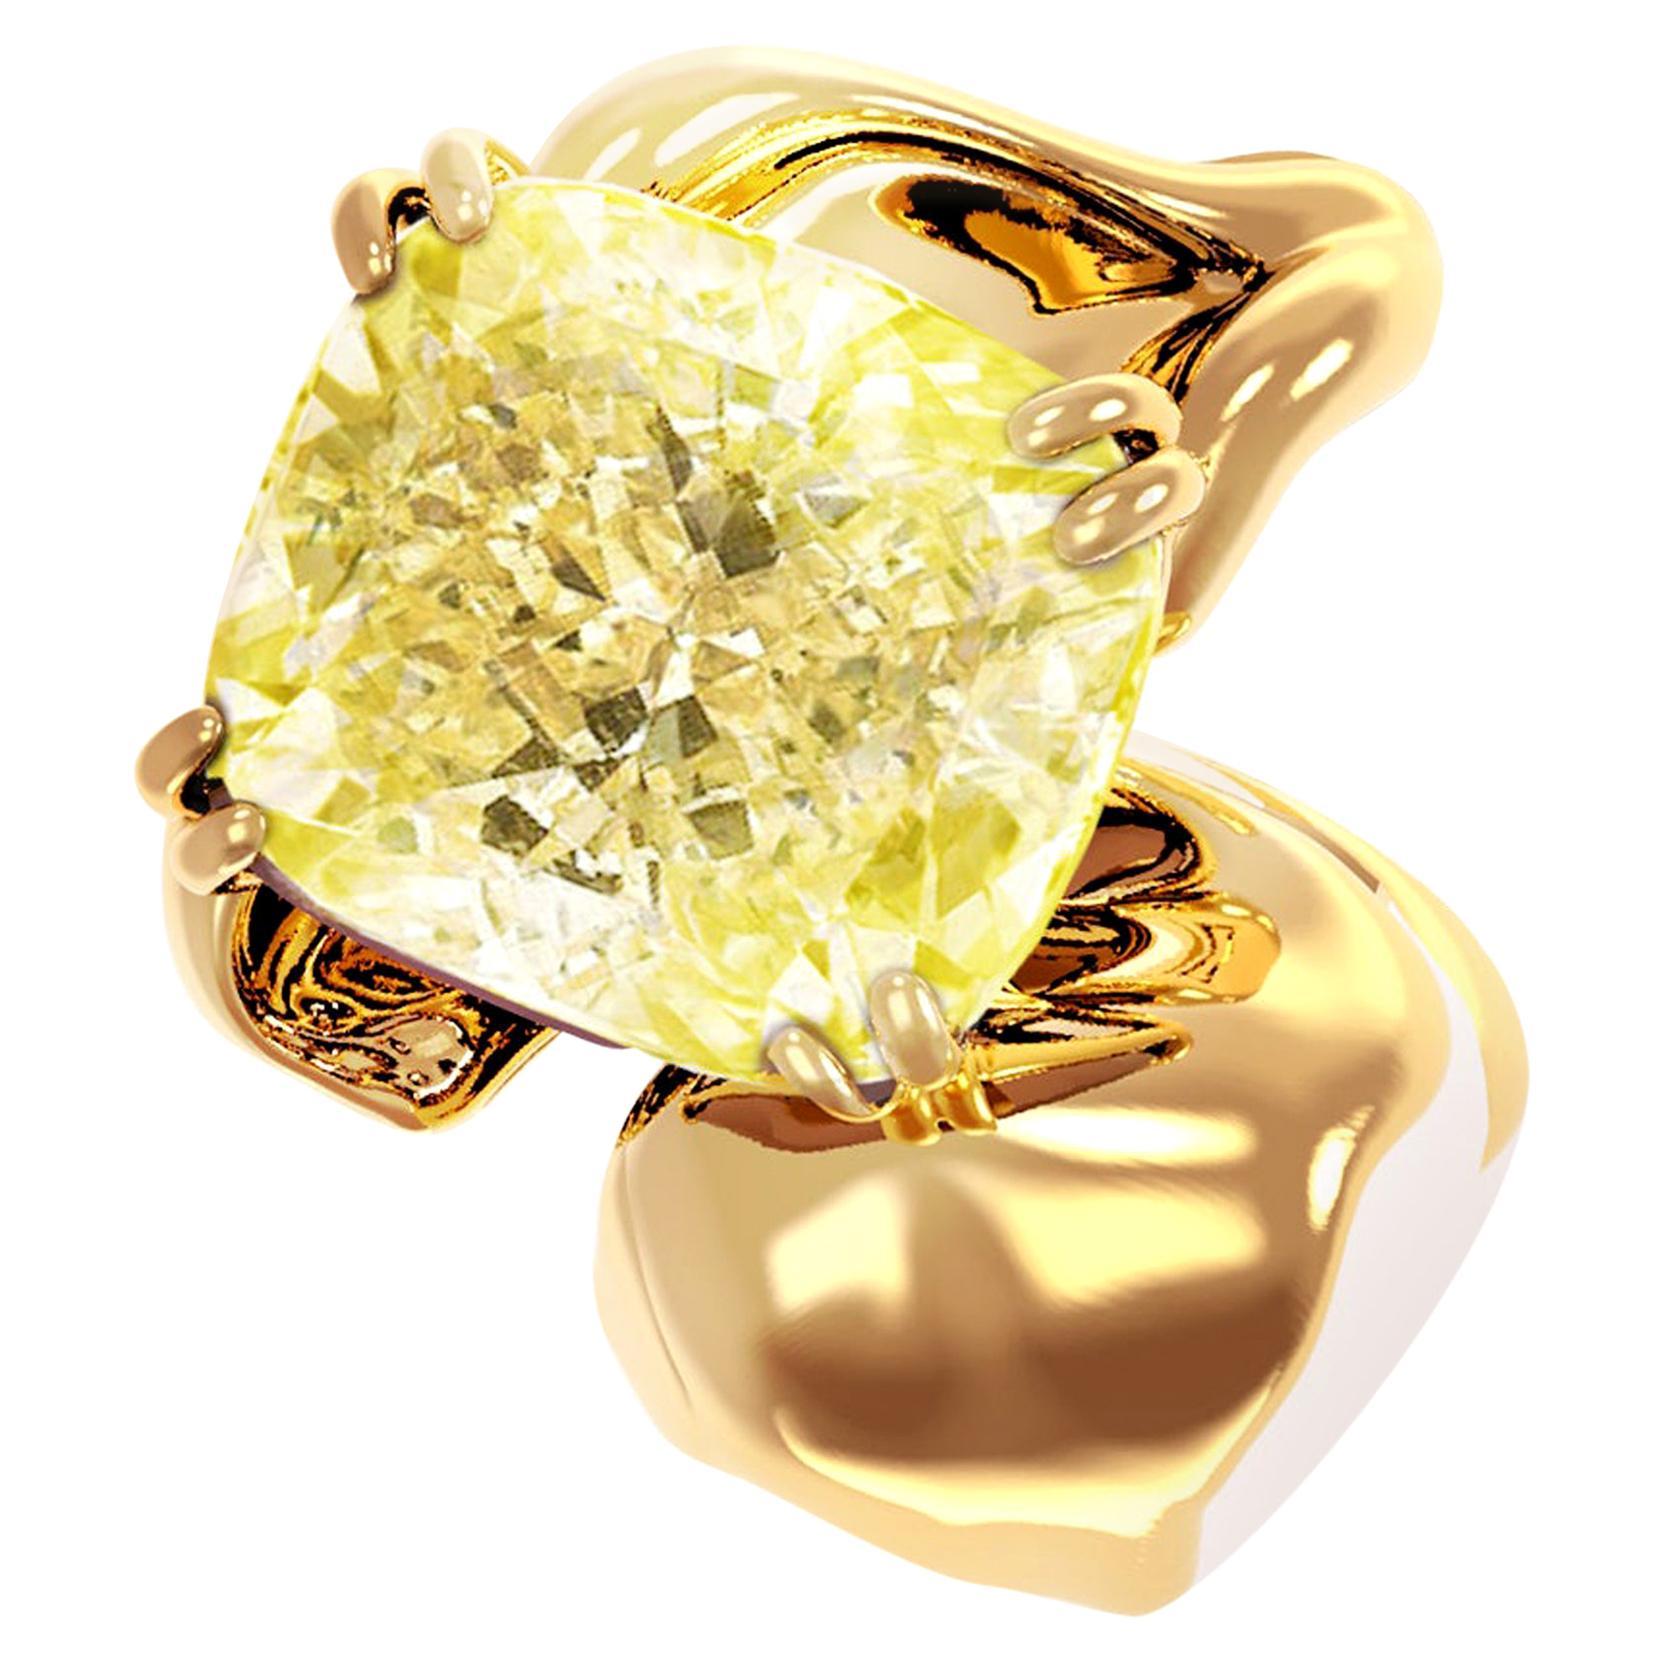 18 Karat Yellow Gold Pendant Necklace with 1 Carat GIA Certified Yellow Diamond